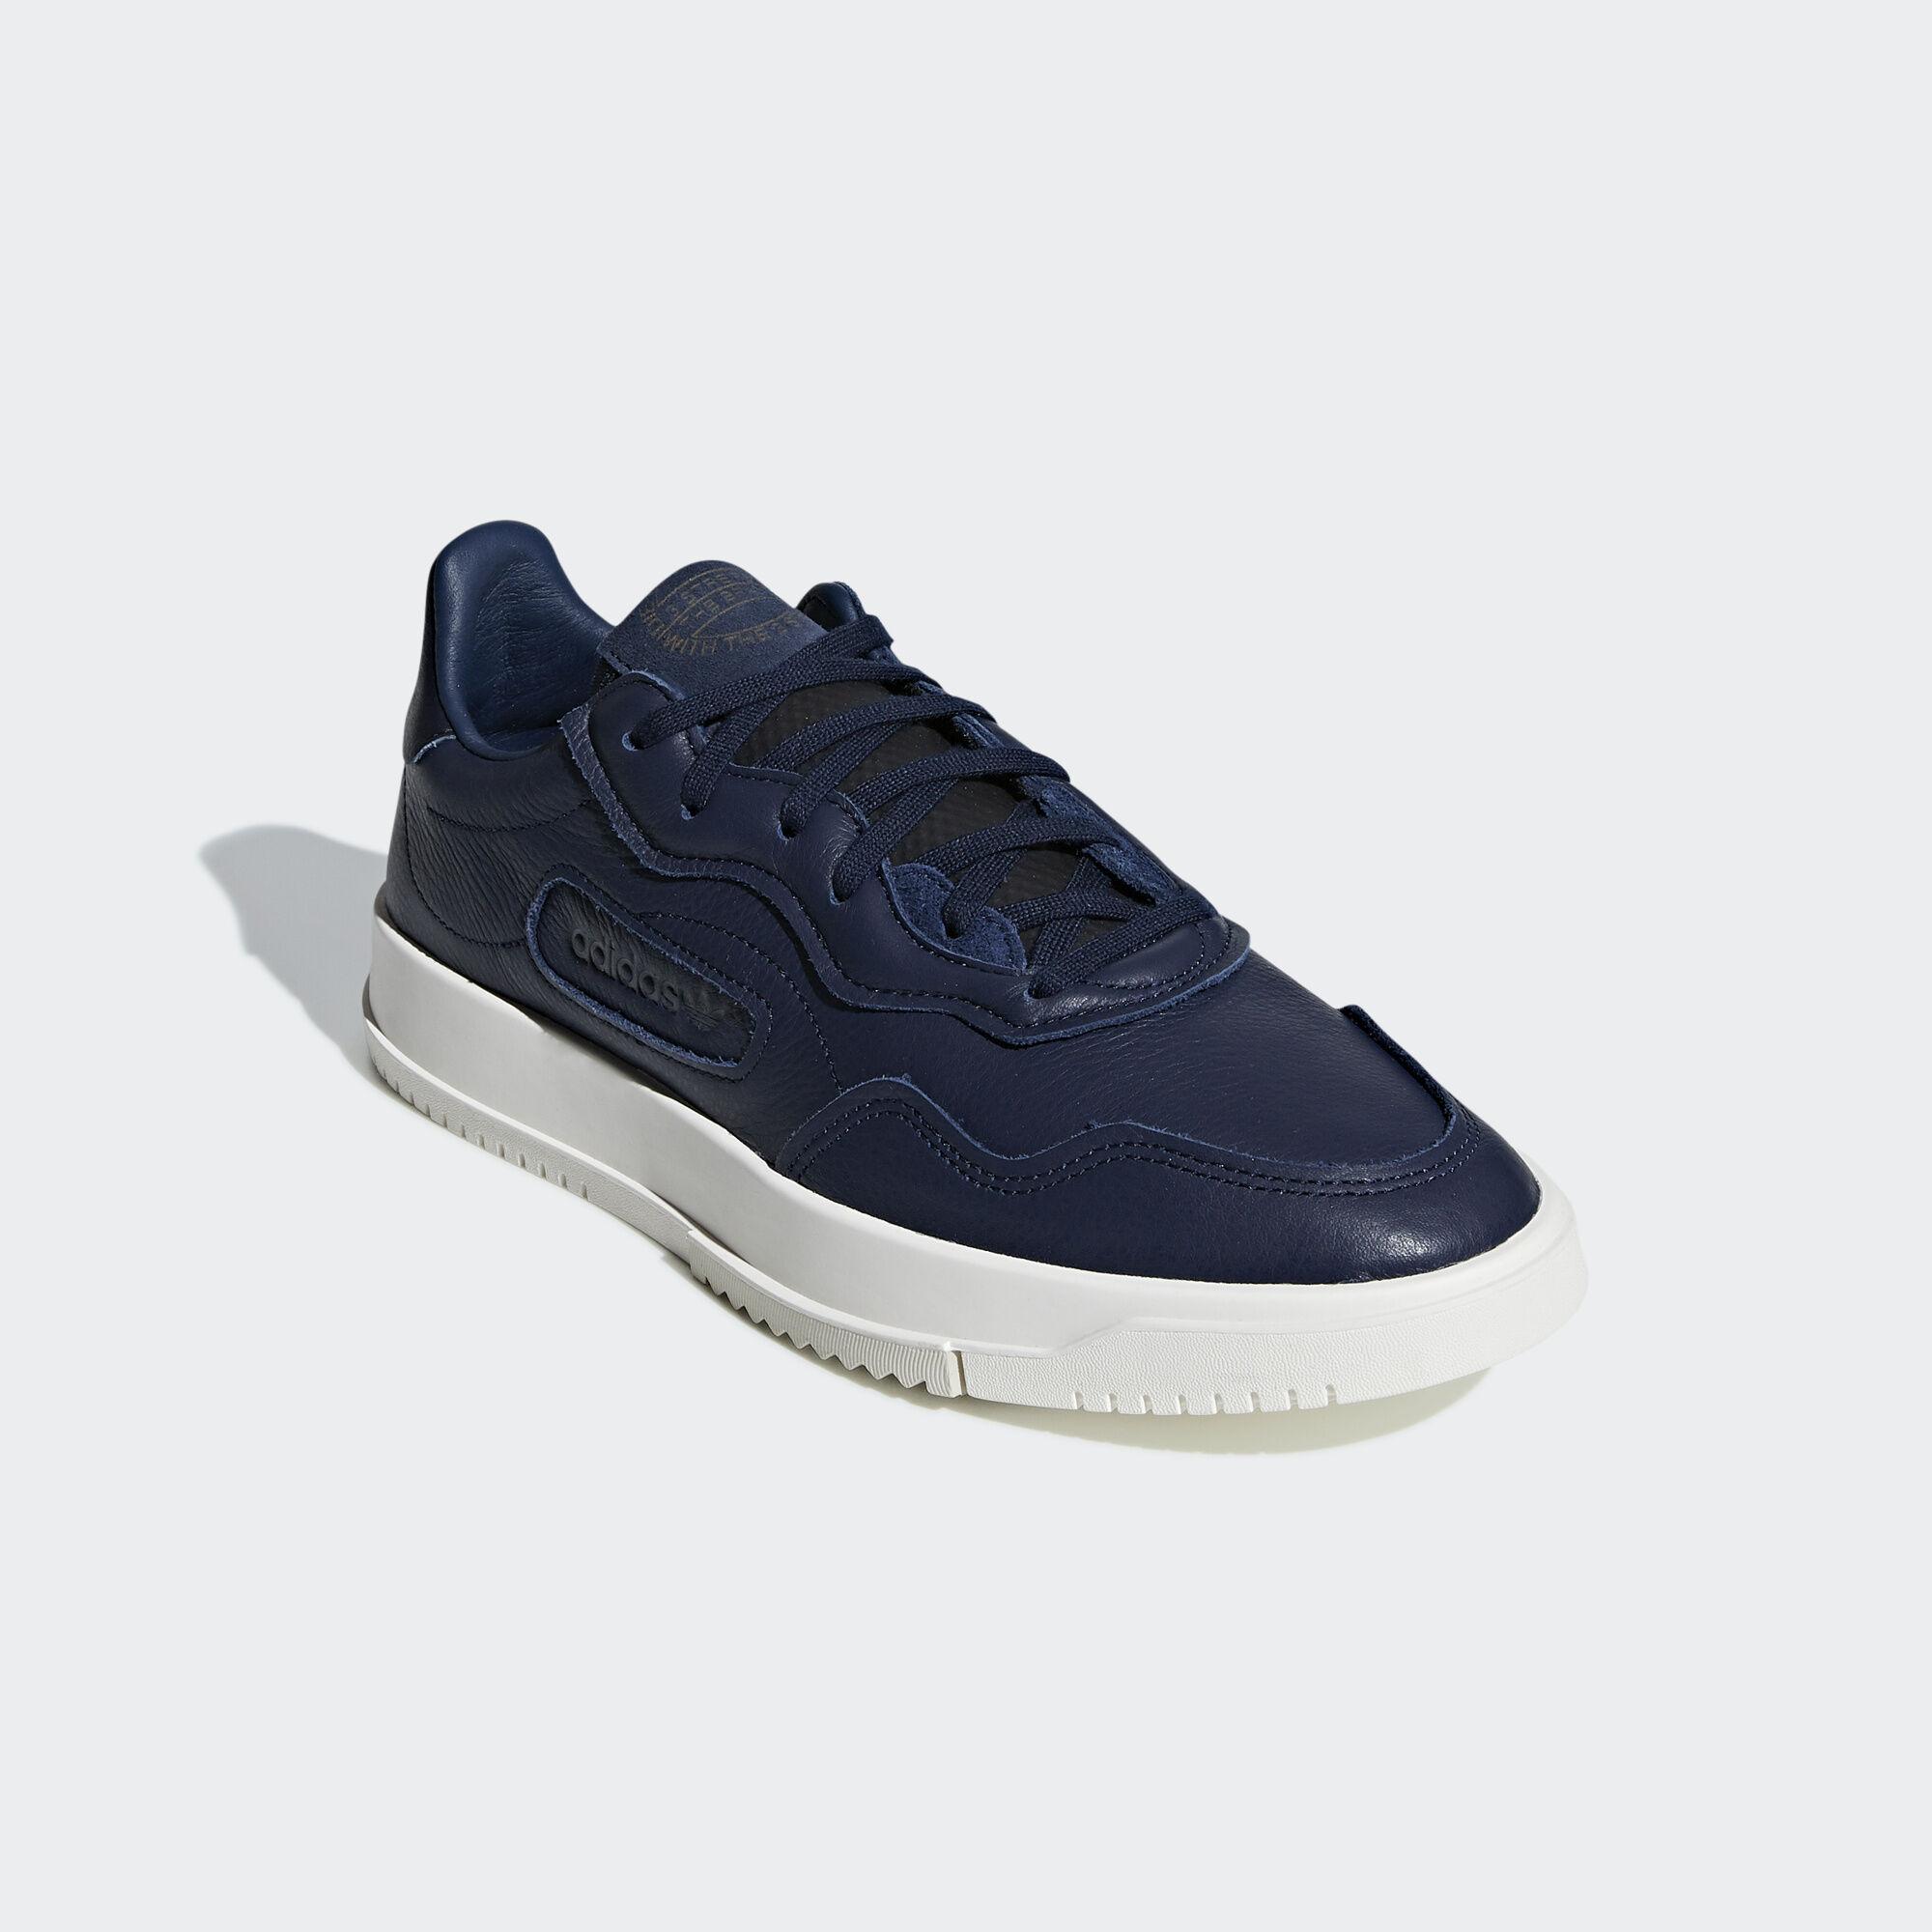 Adidas SC Premiere Collegiate Navy / Legend Ink / Carbon (BD7599)